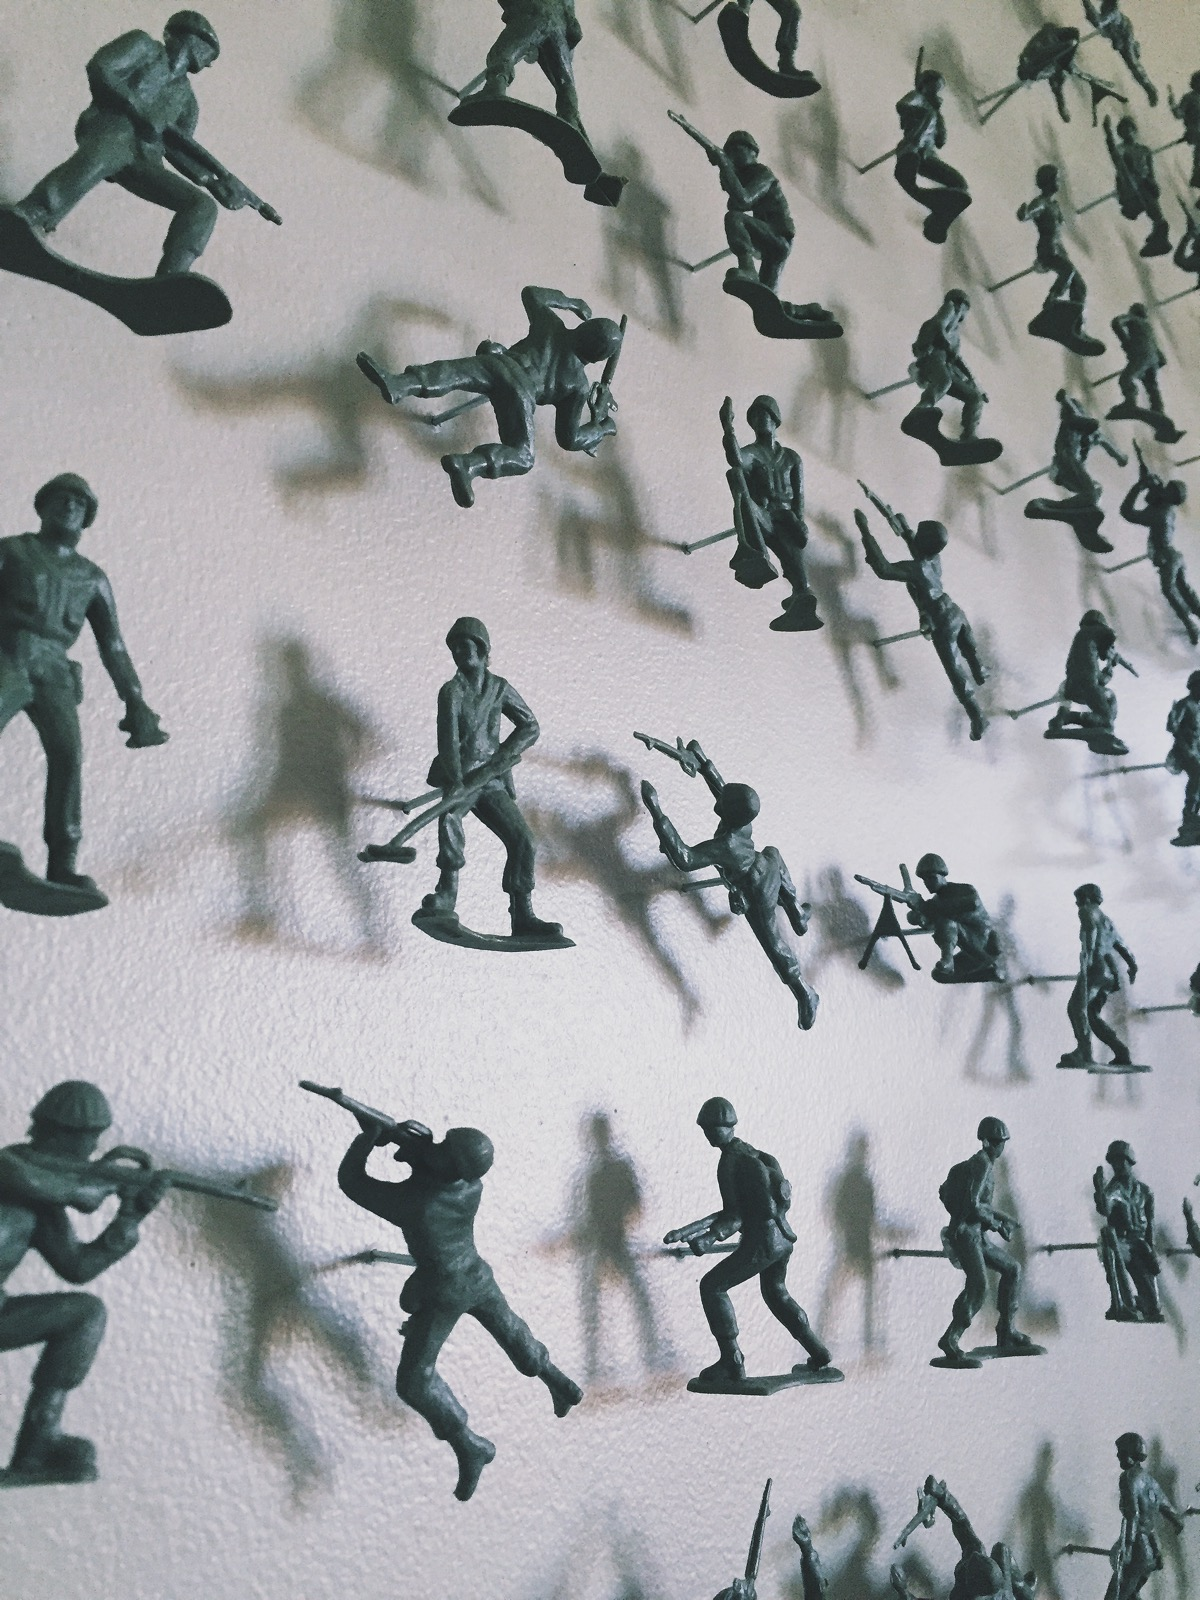 army men as wallpaper. no, but really.